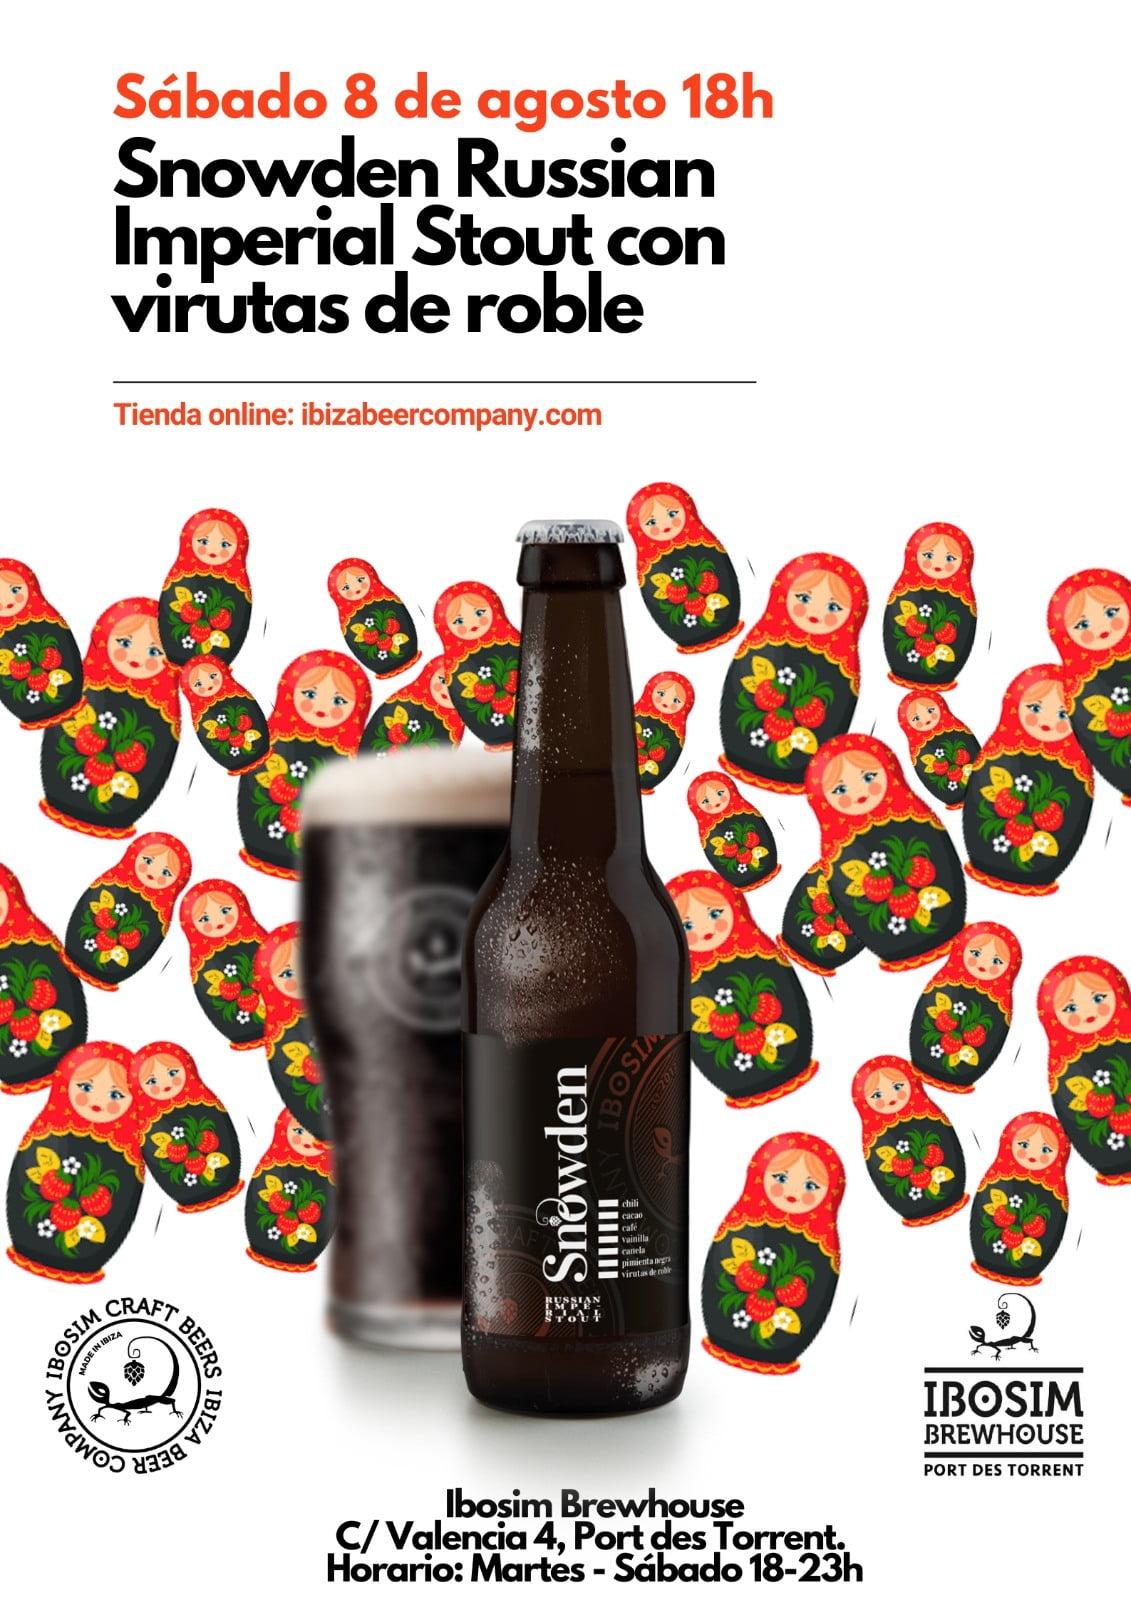 Snowden russian imperial stout cervezas ibosim